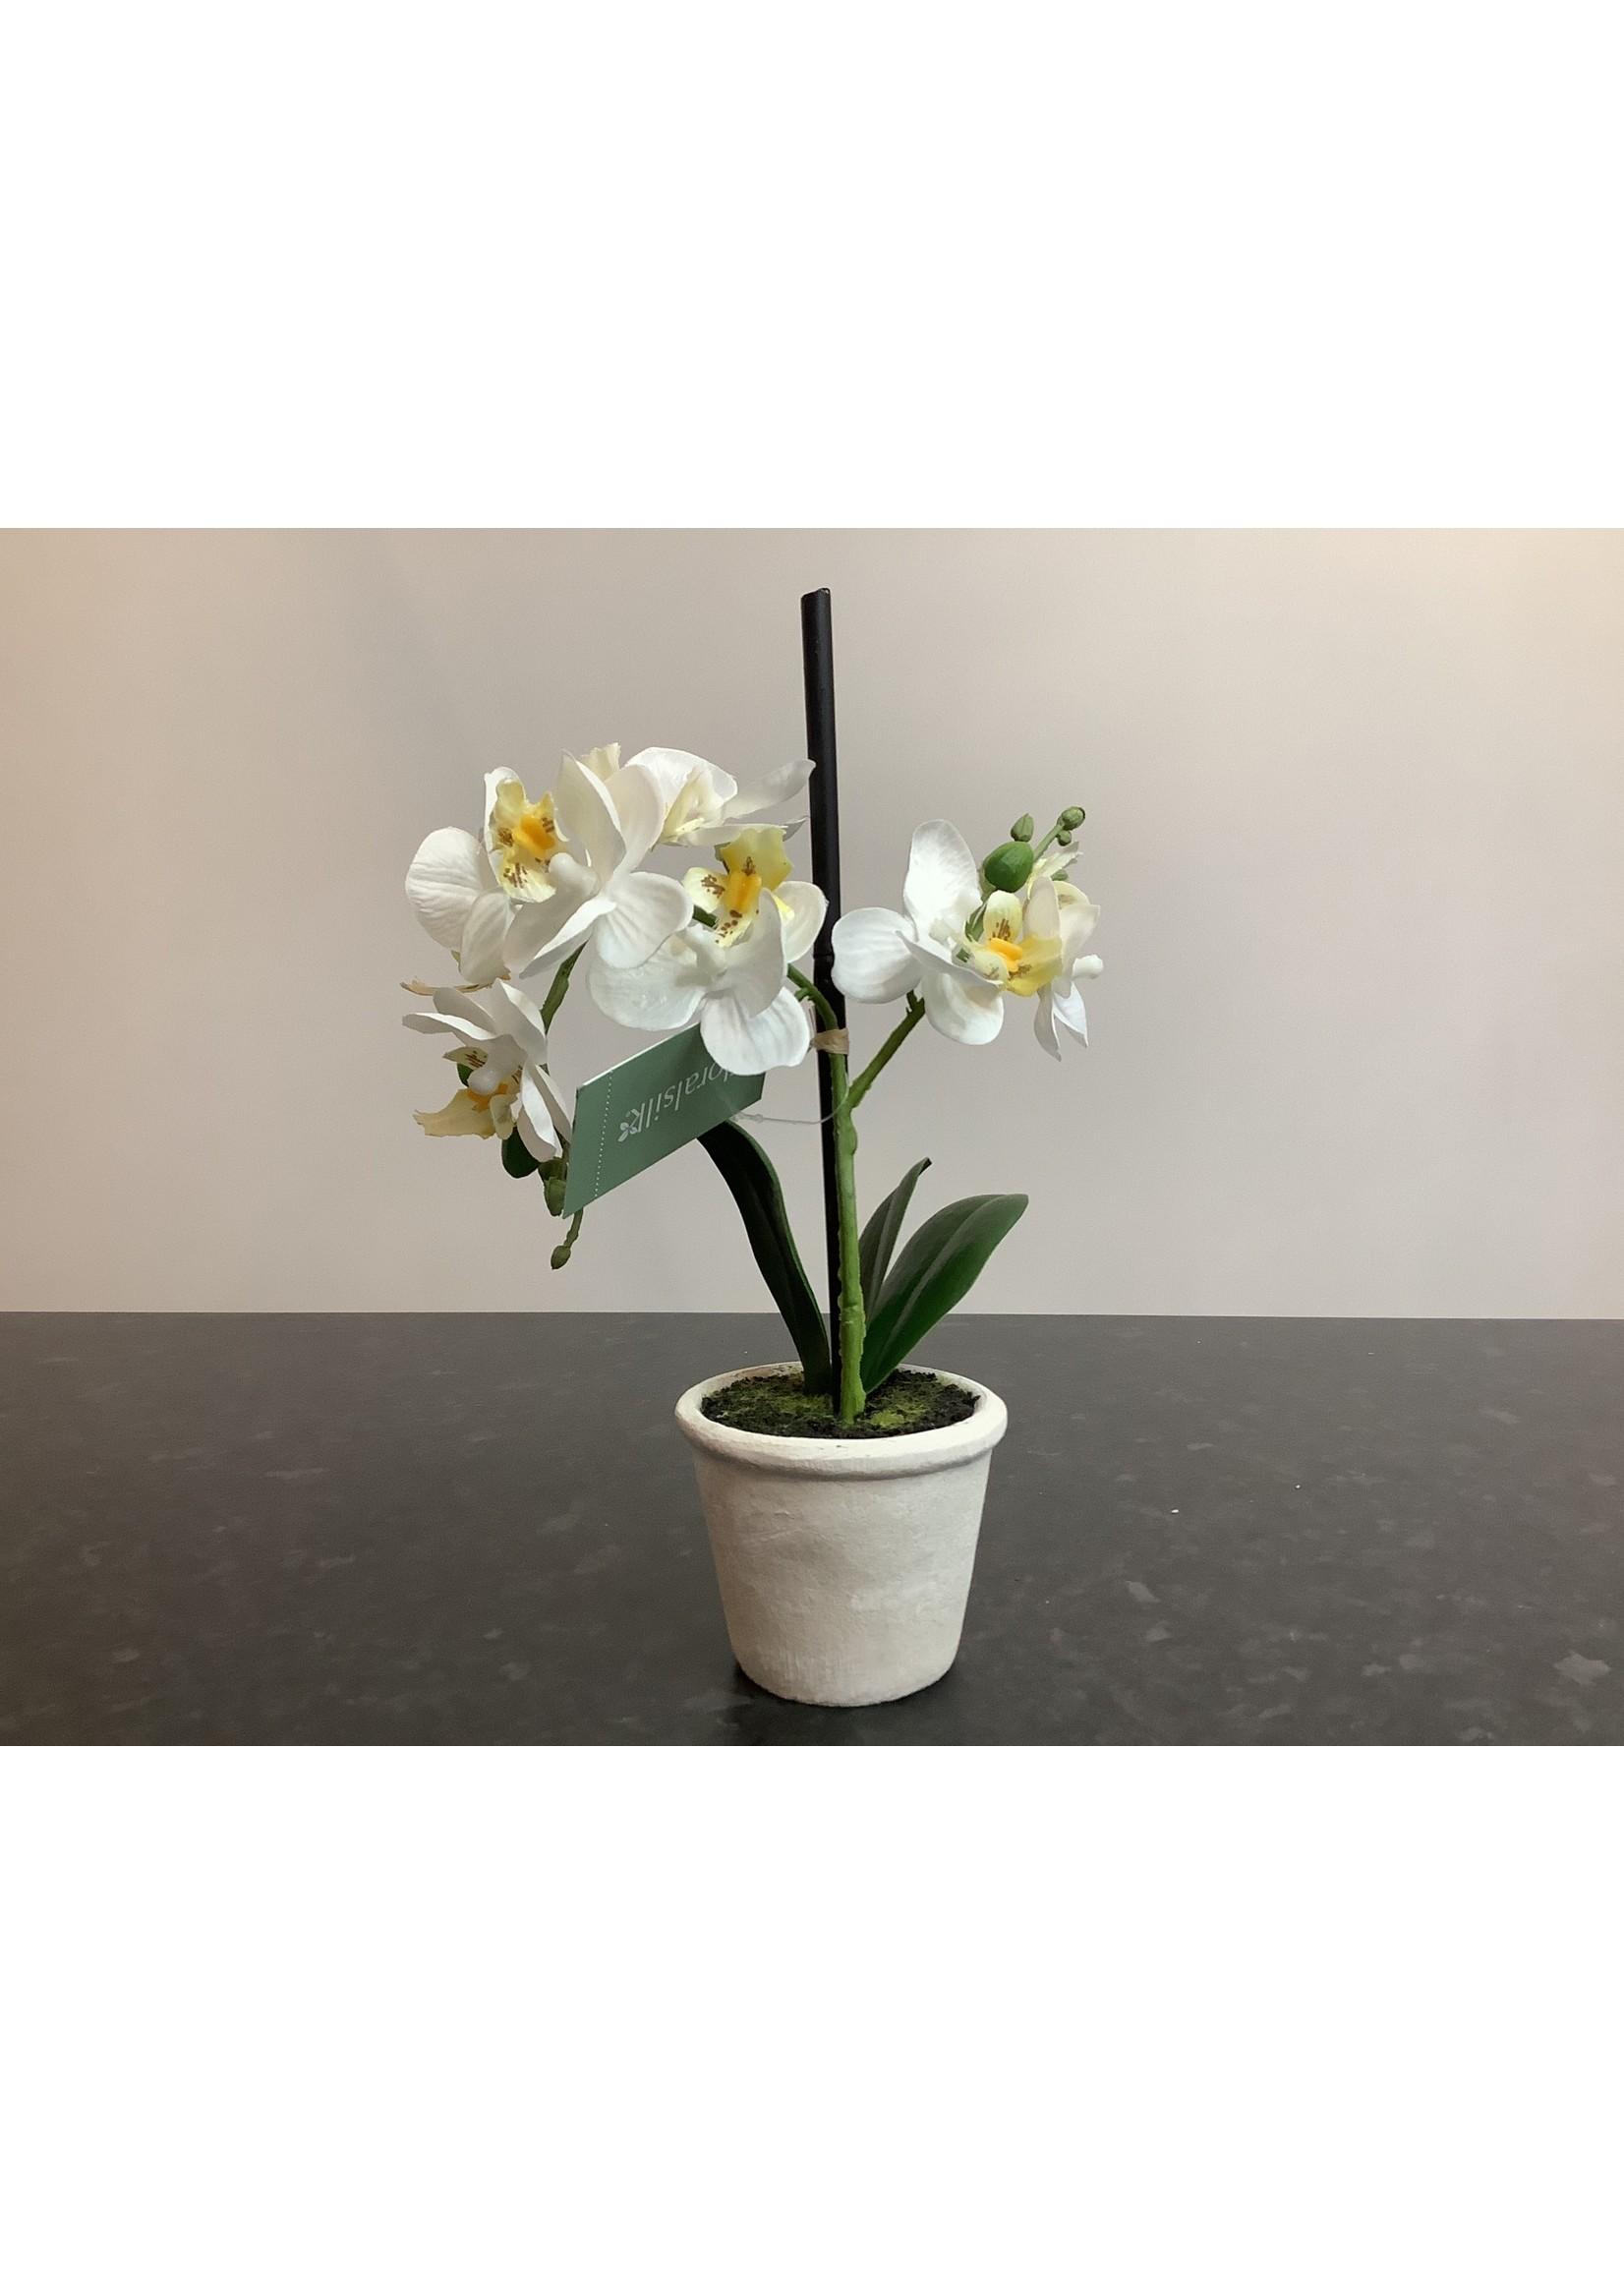 Small orchid arrangement 30cm tall